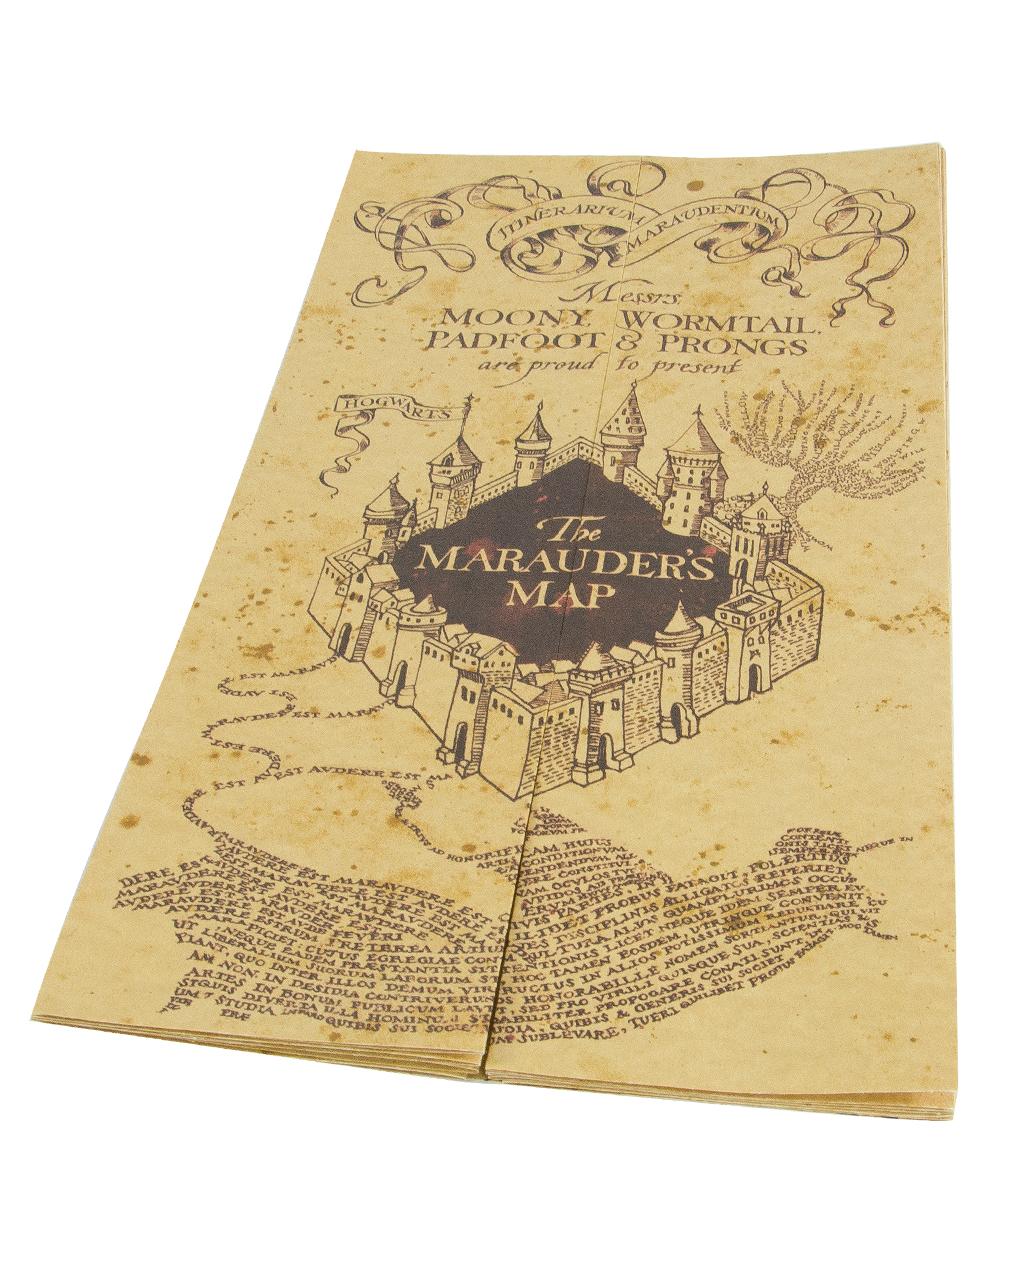 Harry Potter Karte Des Rumtreibers Tattoo.The Map Of The Marauder